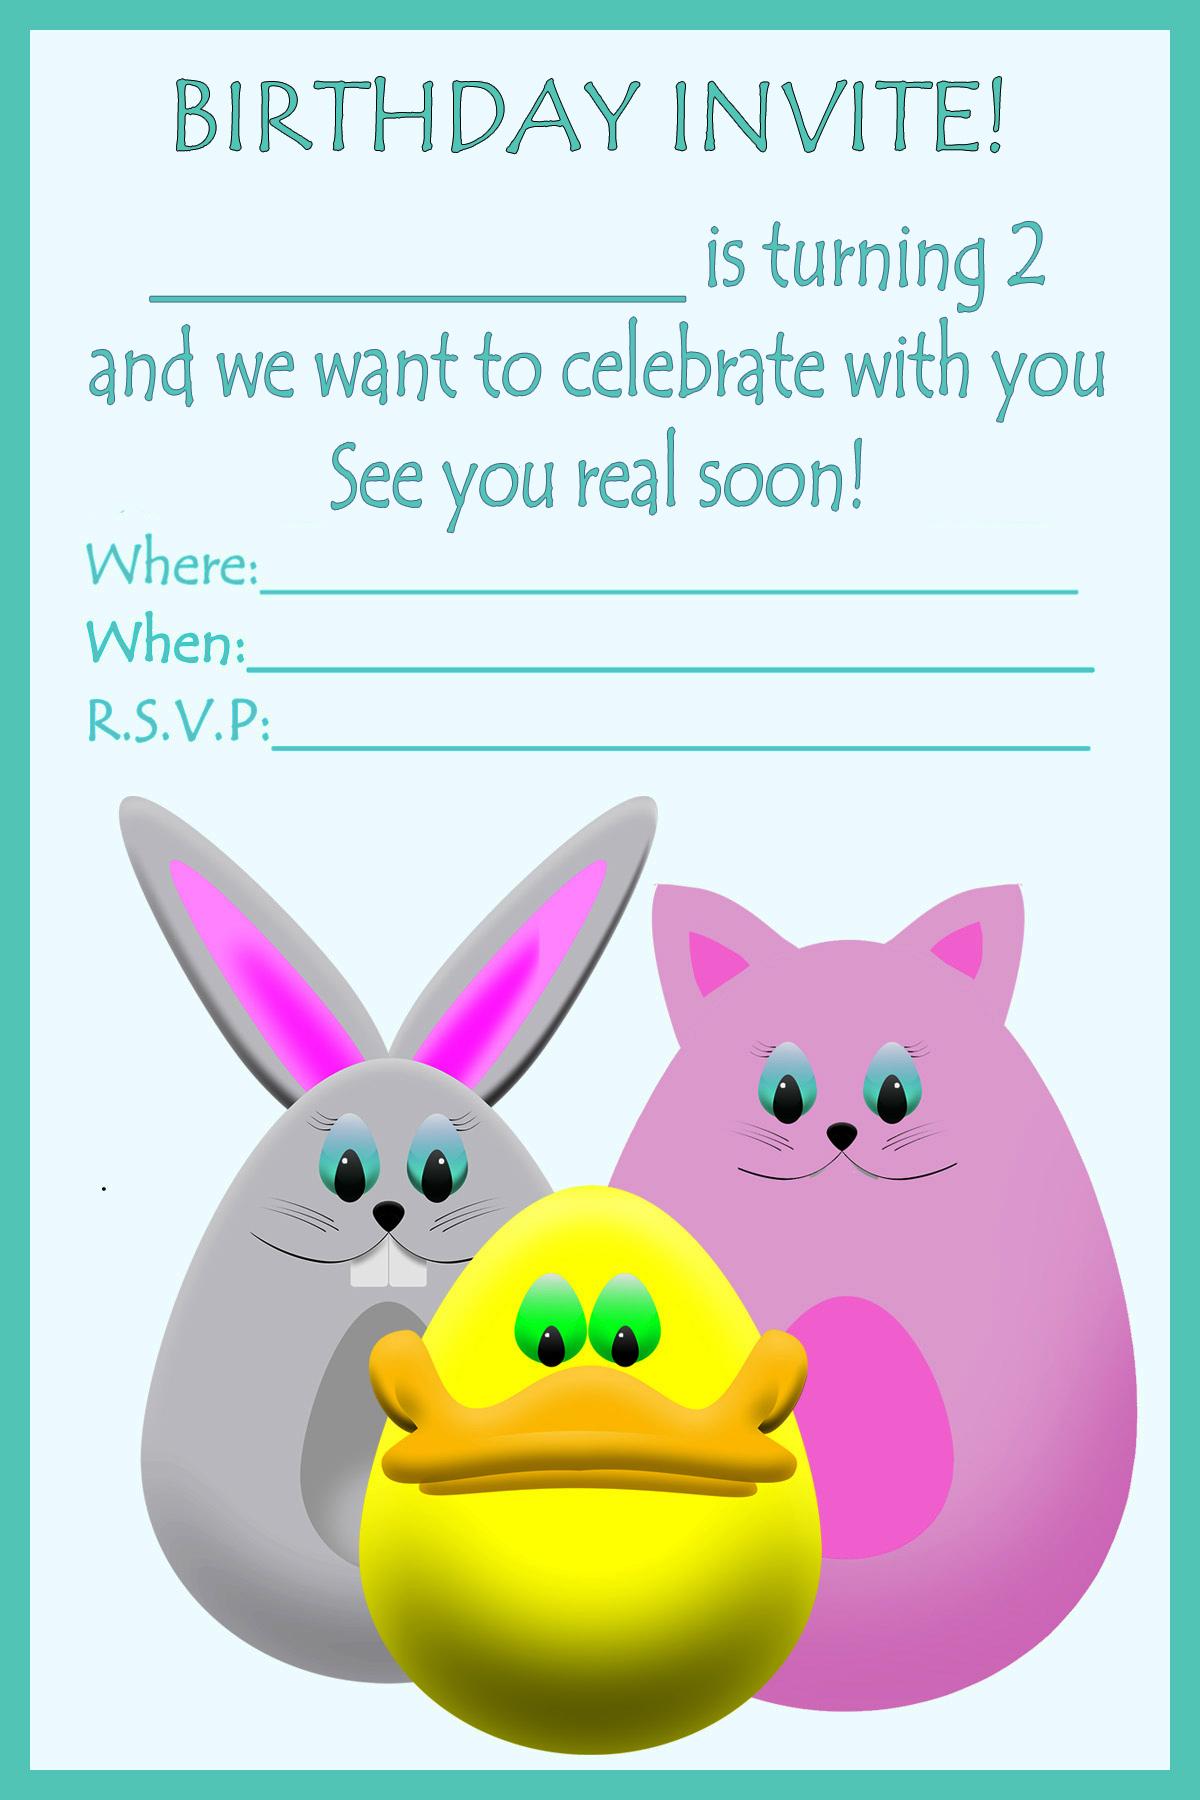 2nd birthday invite